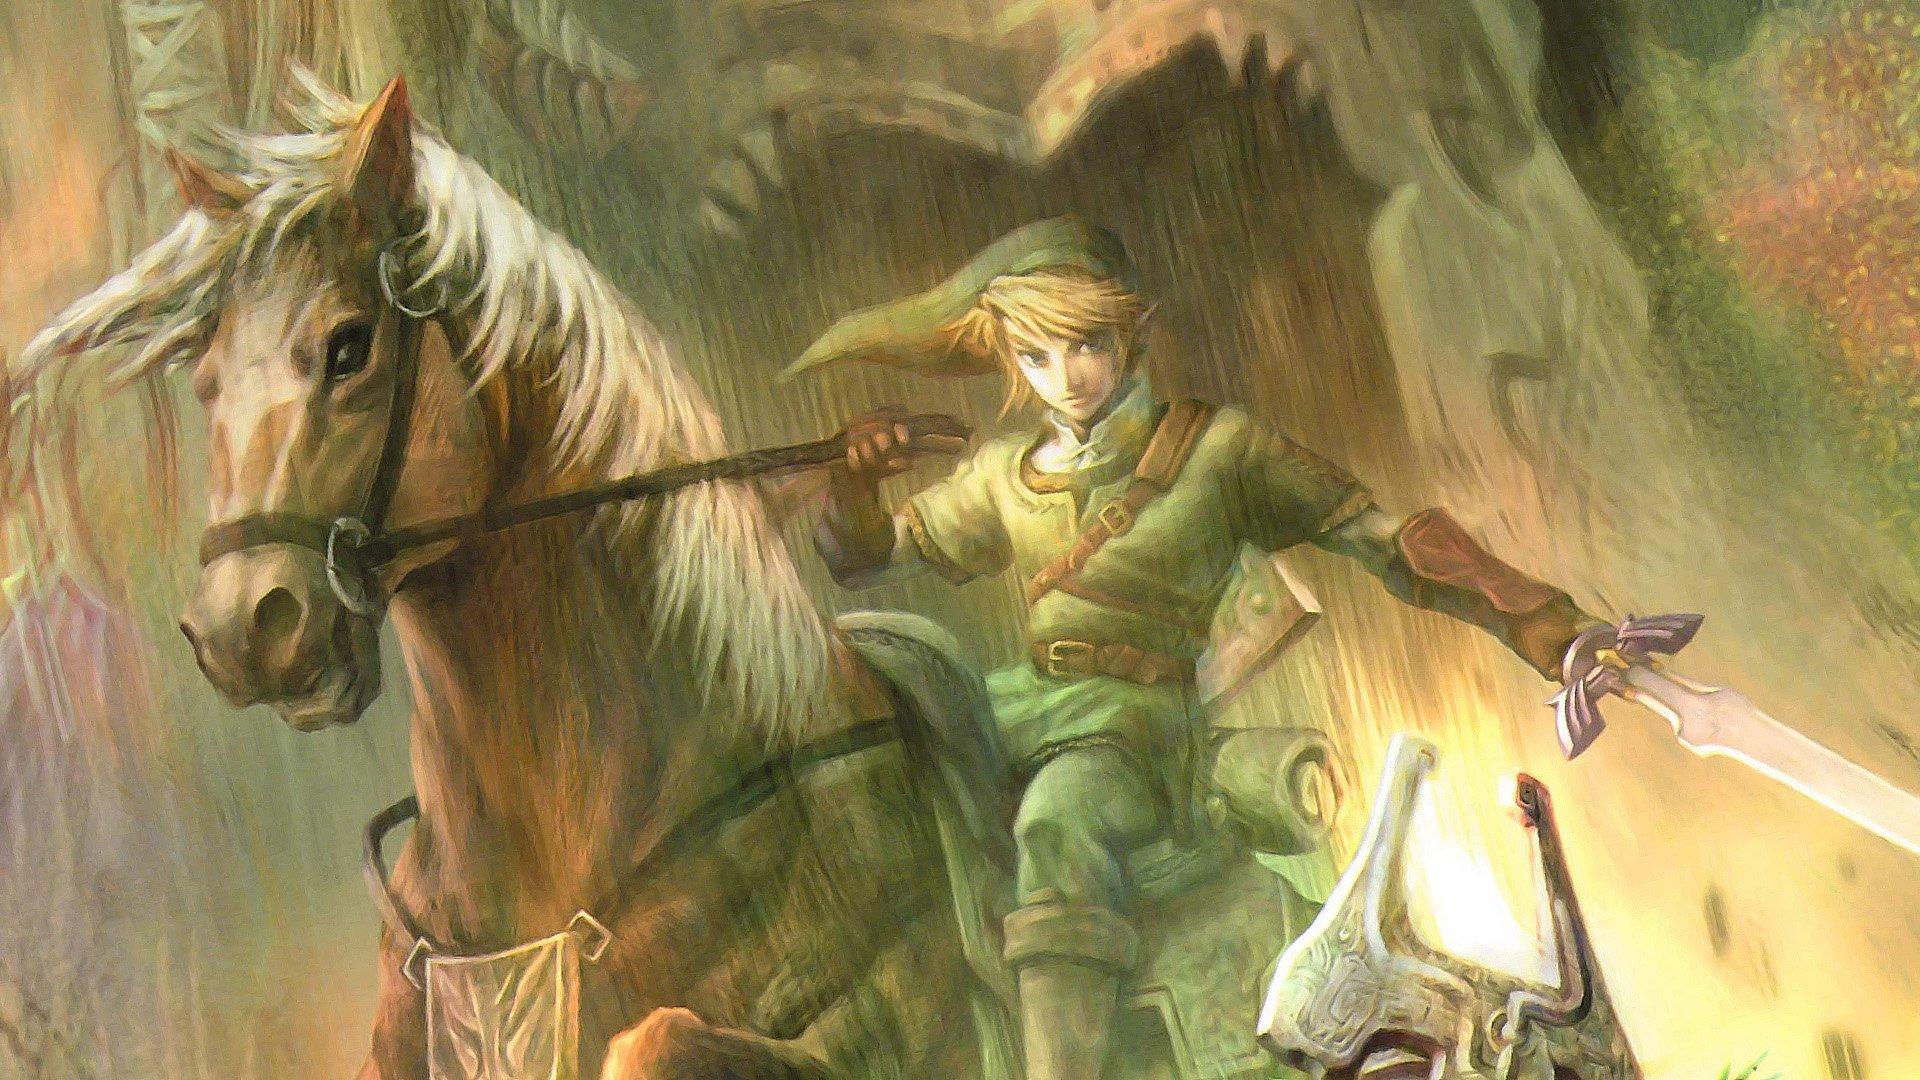 The Legend Of Zelda Twilight Princess Hd Wallpaper Background